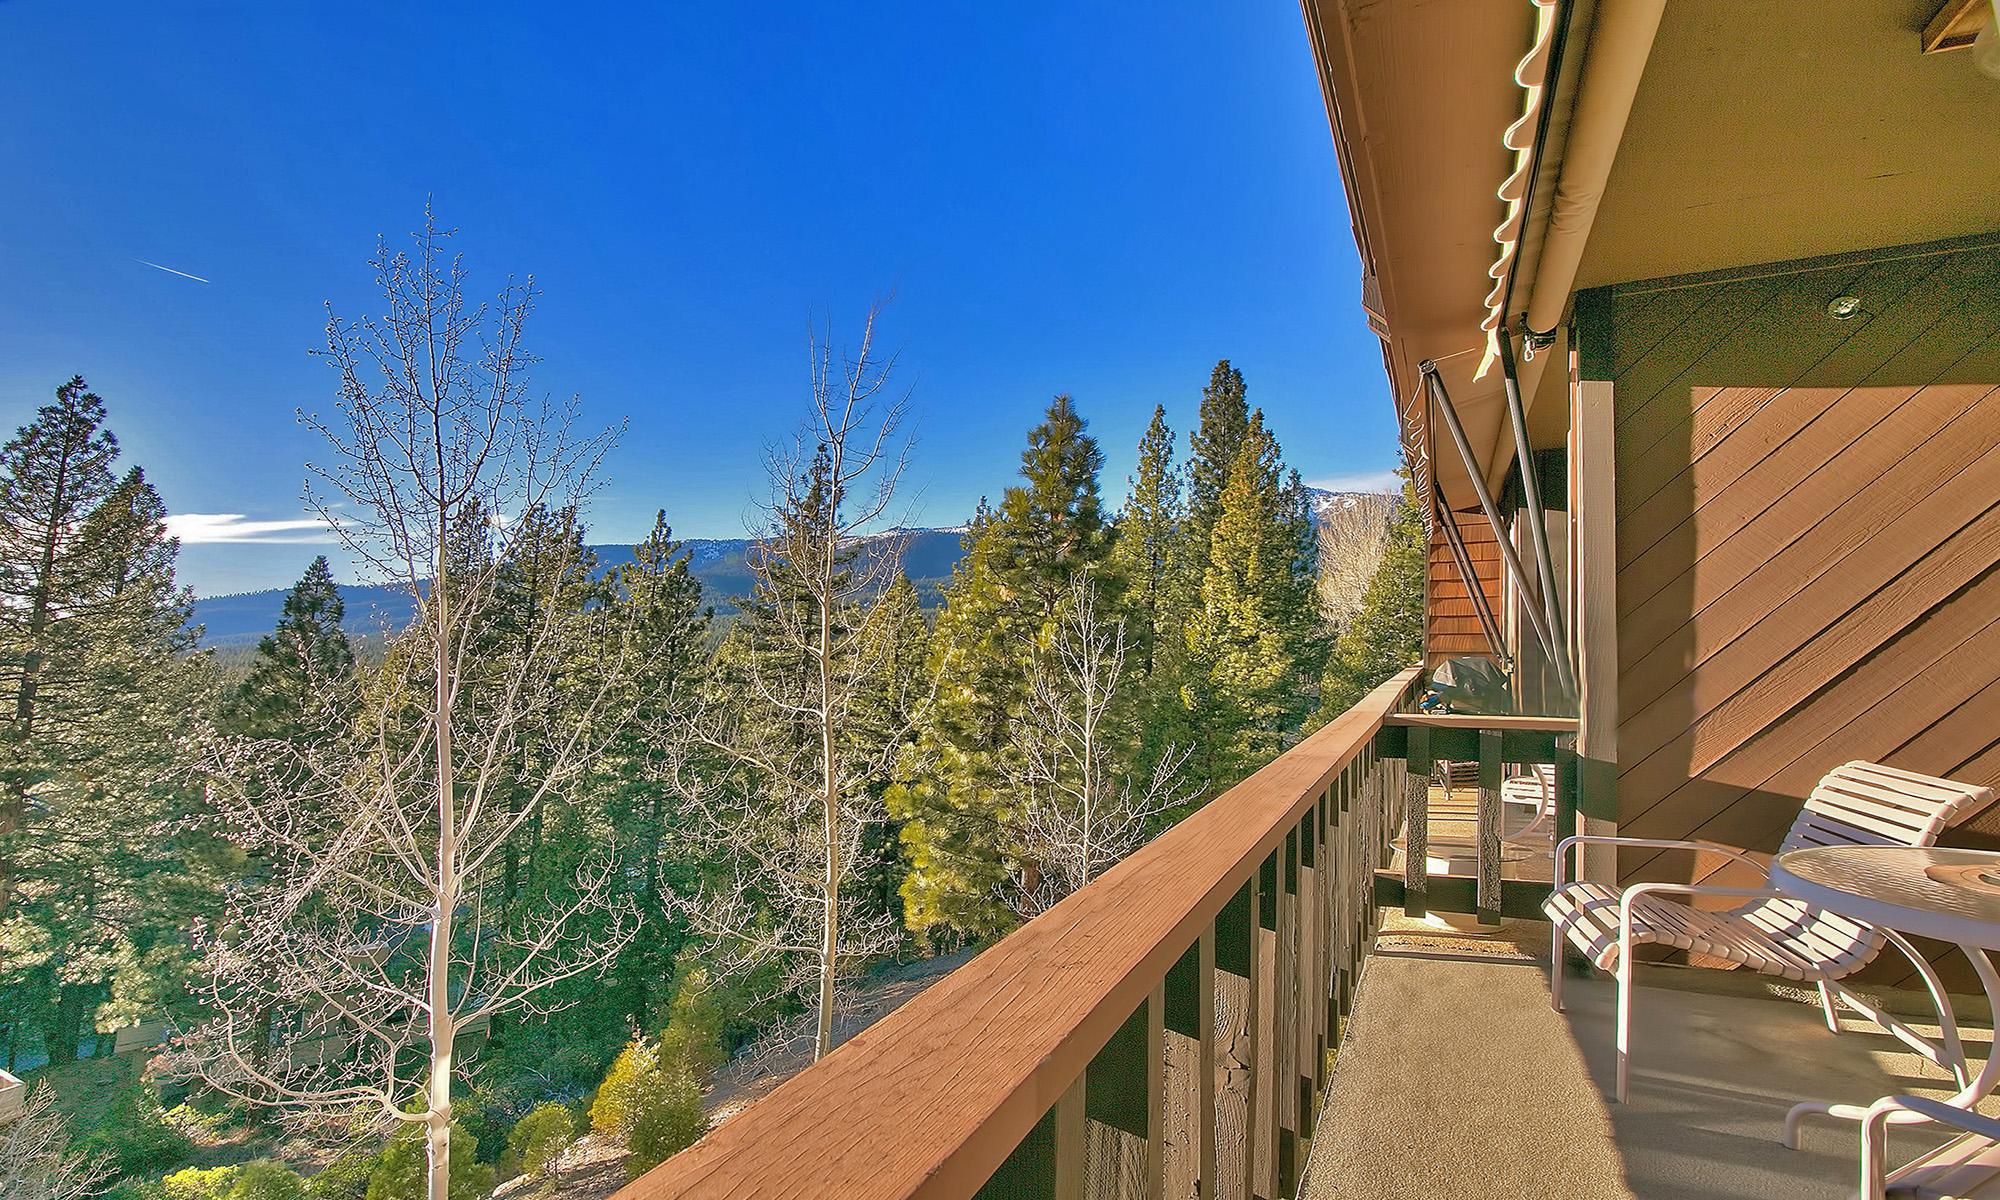 Condominium for Sale at Burgundy Hill 335 Ski Way #320 Incline Village, Nevada 89451 United States